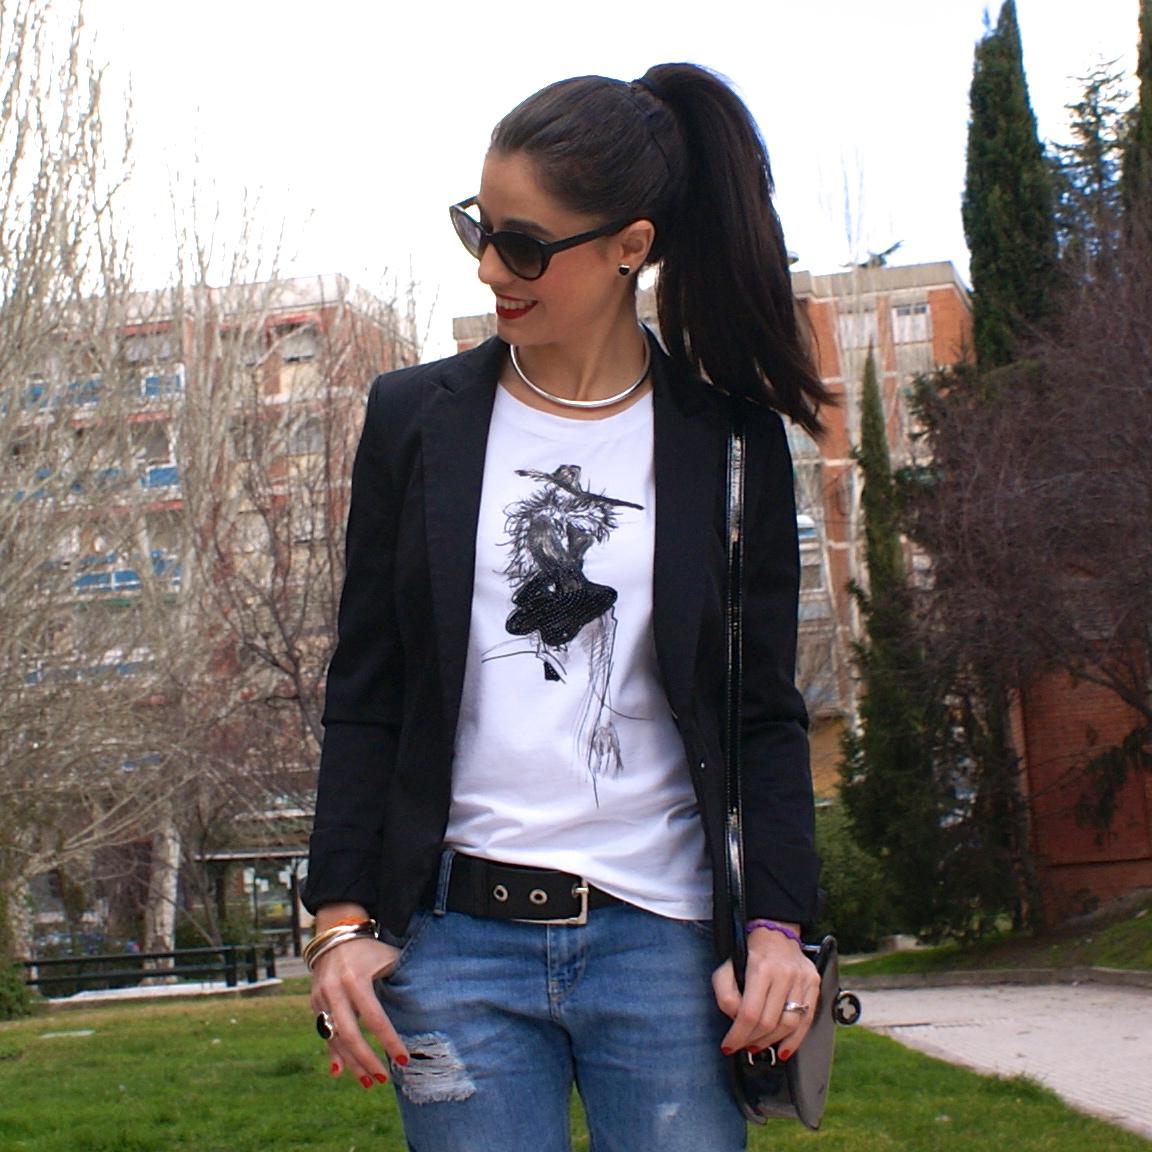 LaCaprichossa - fashion blogger - street style - boyfriend jeans - camiseta roberto verino - lentejuelas - pulseras cruciani - pendientes TOUS - bolso corazon